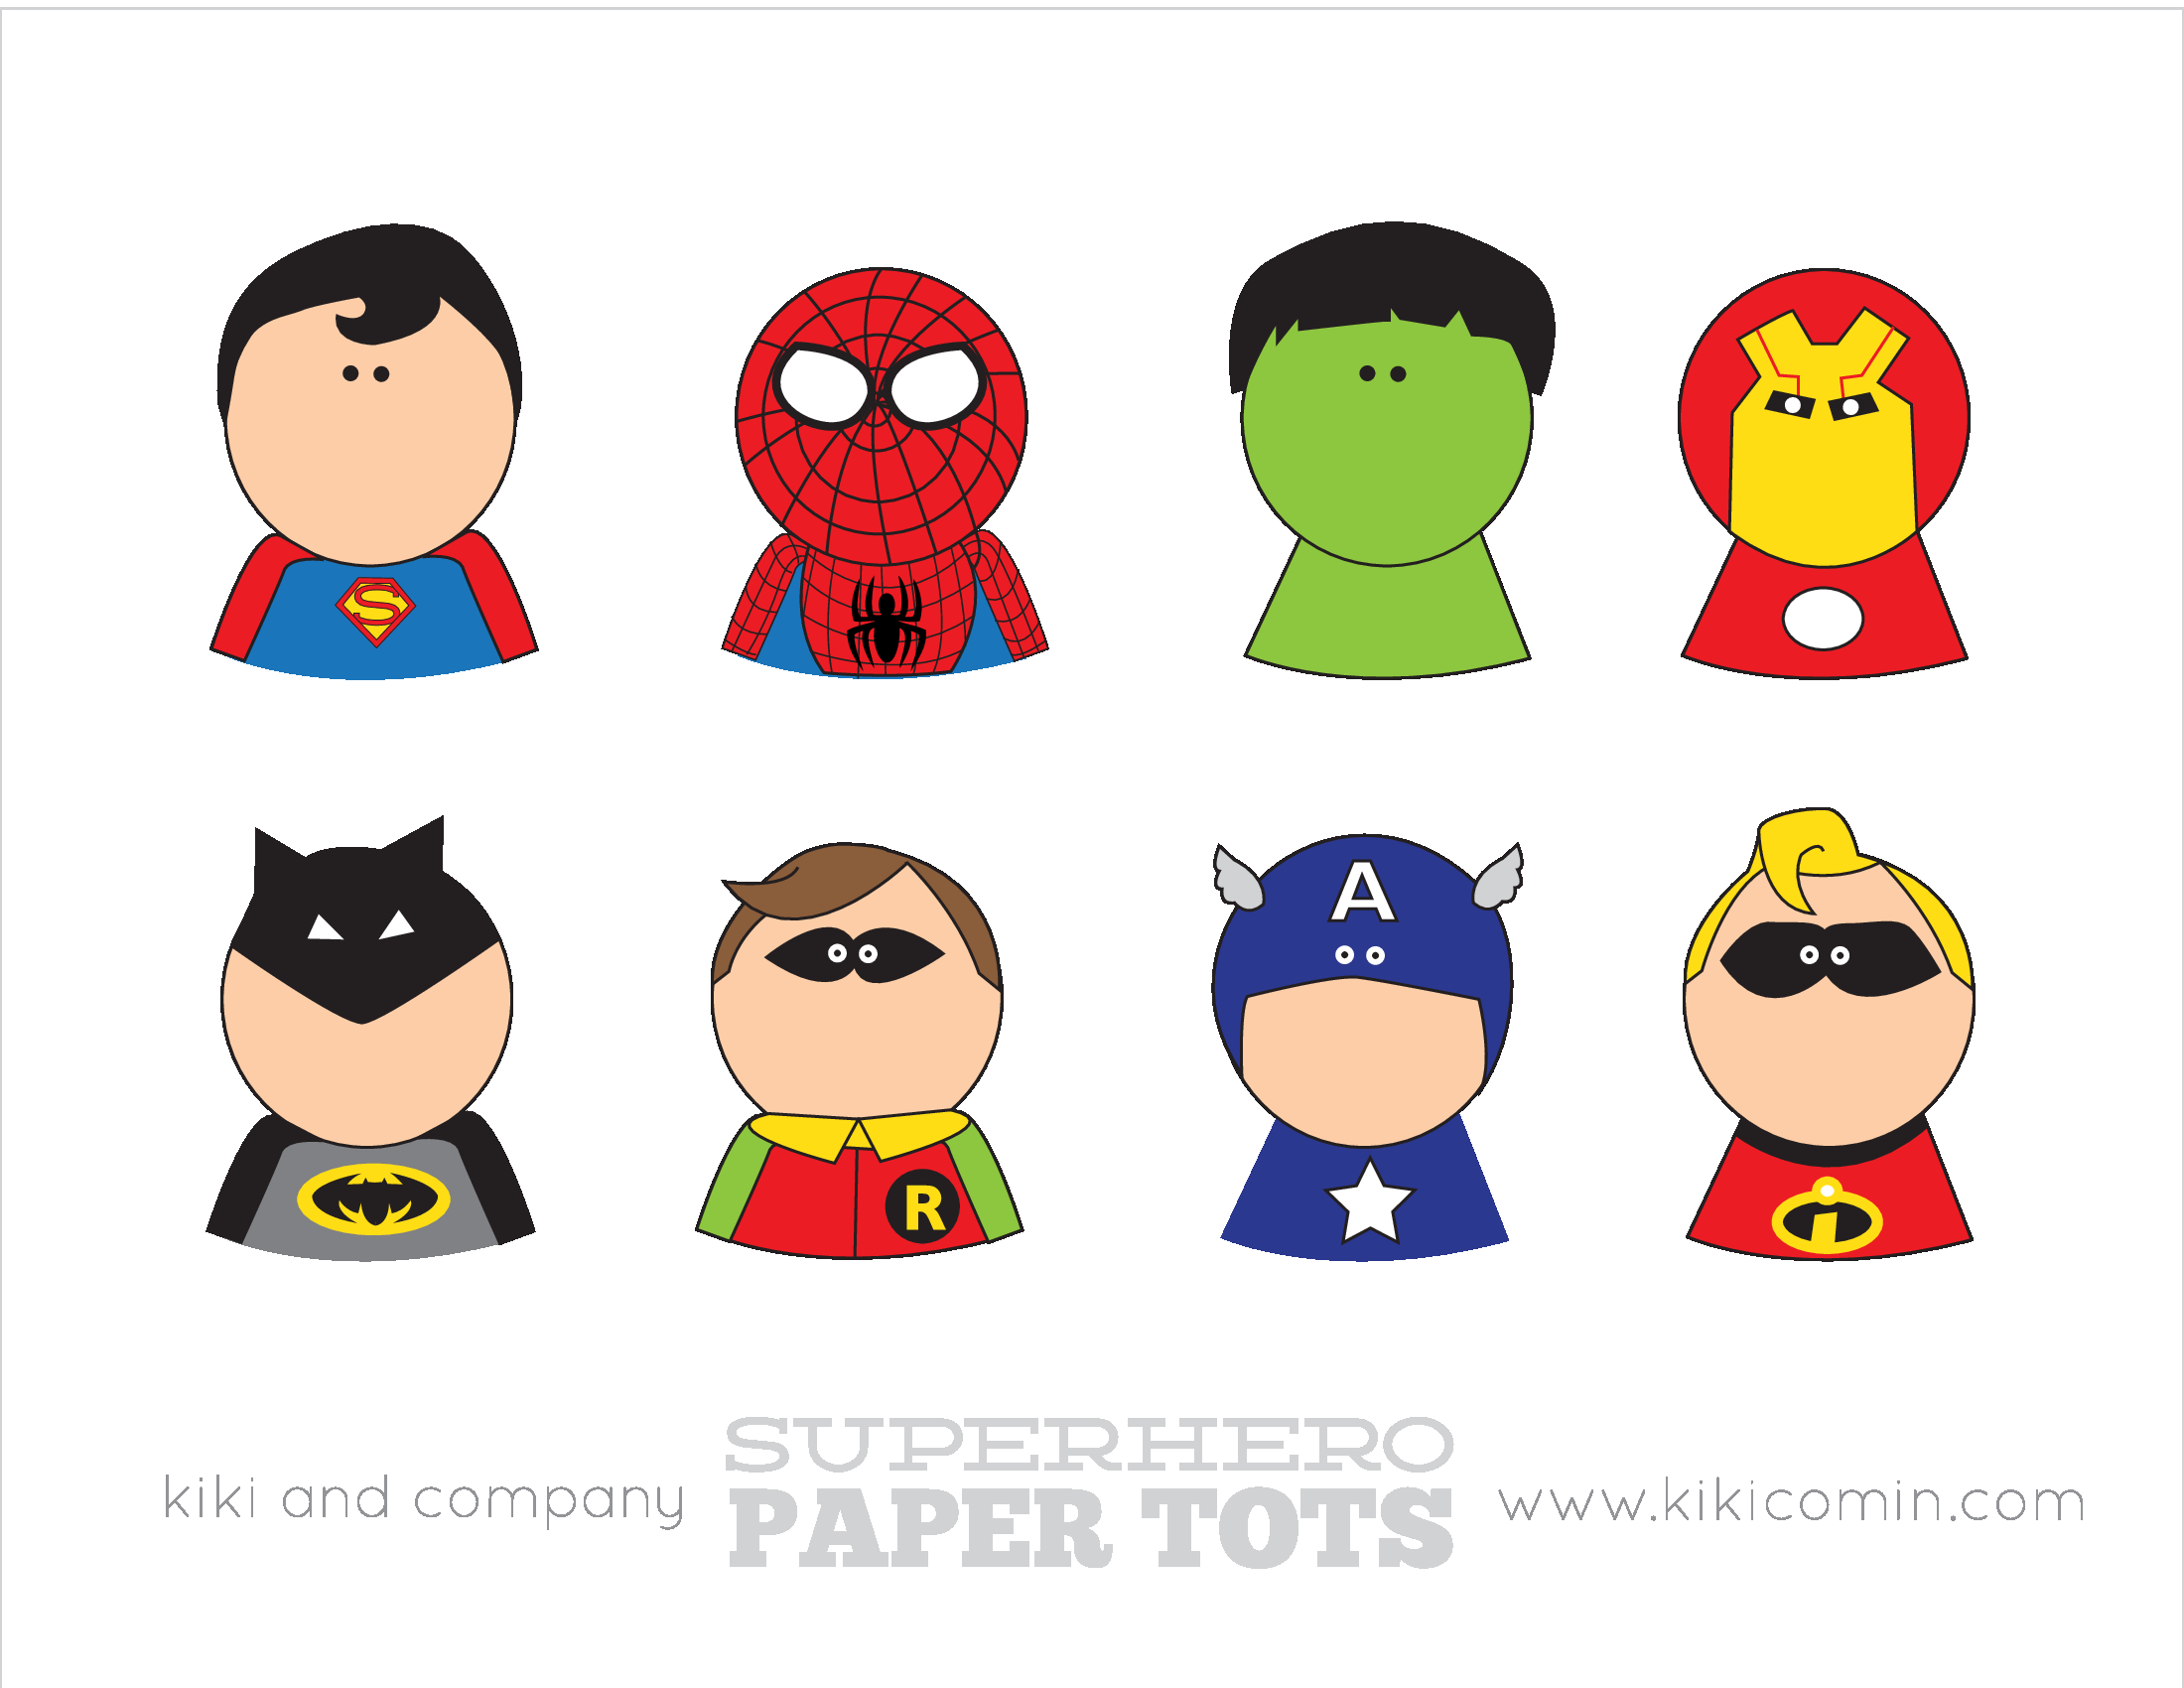 Superhero Paper Tots Regular Size Pdf Superhero Superhero Gifts Superhero Printables